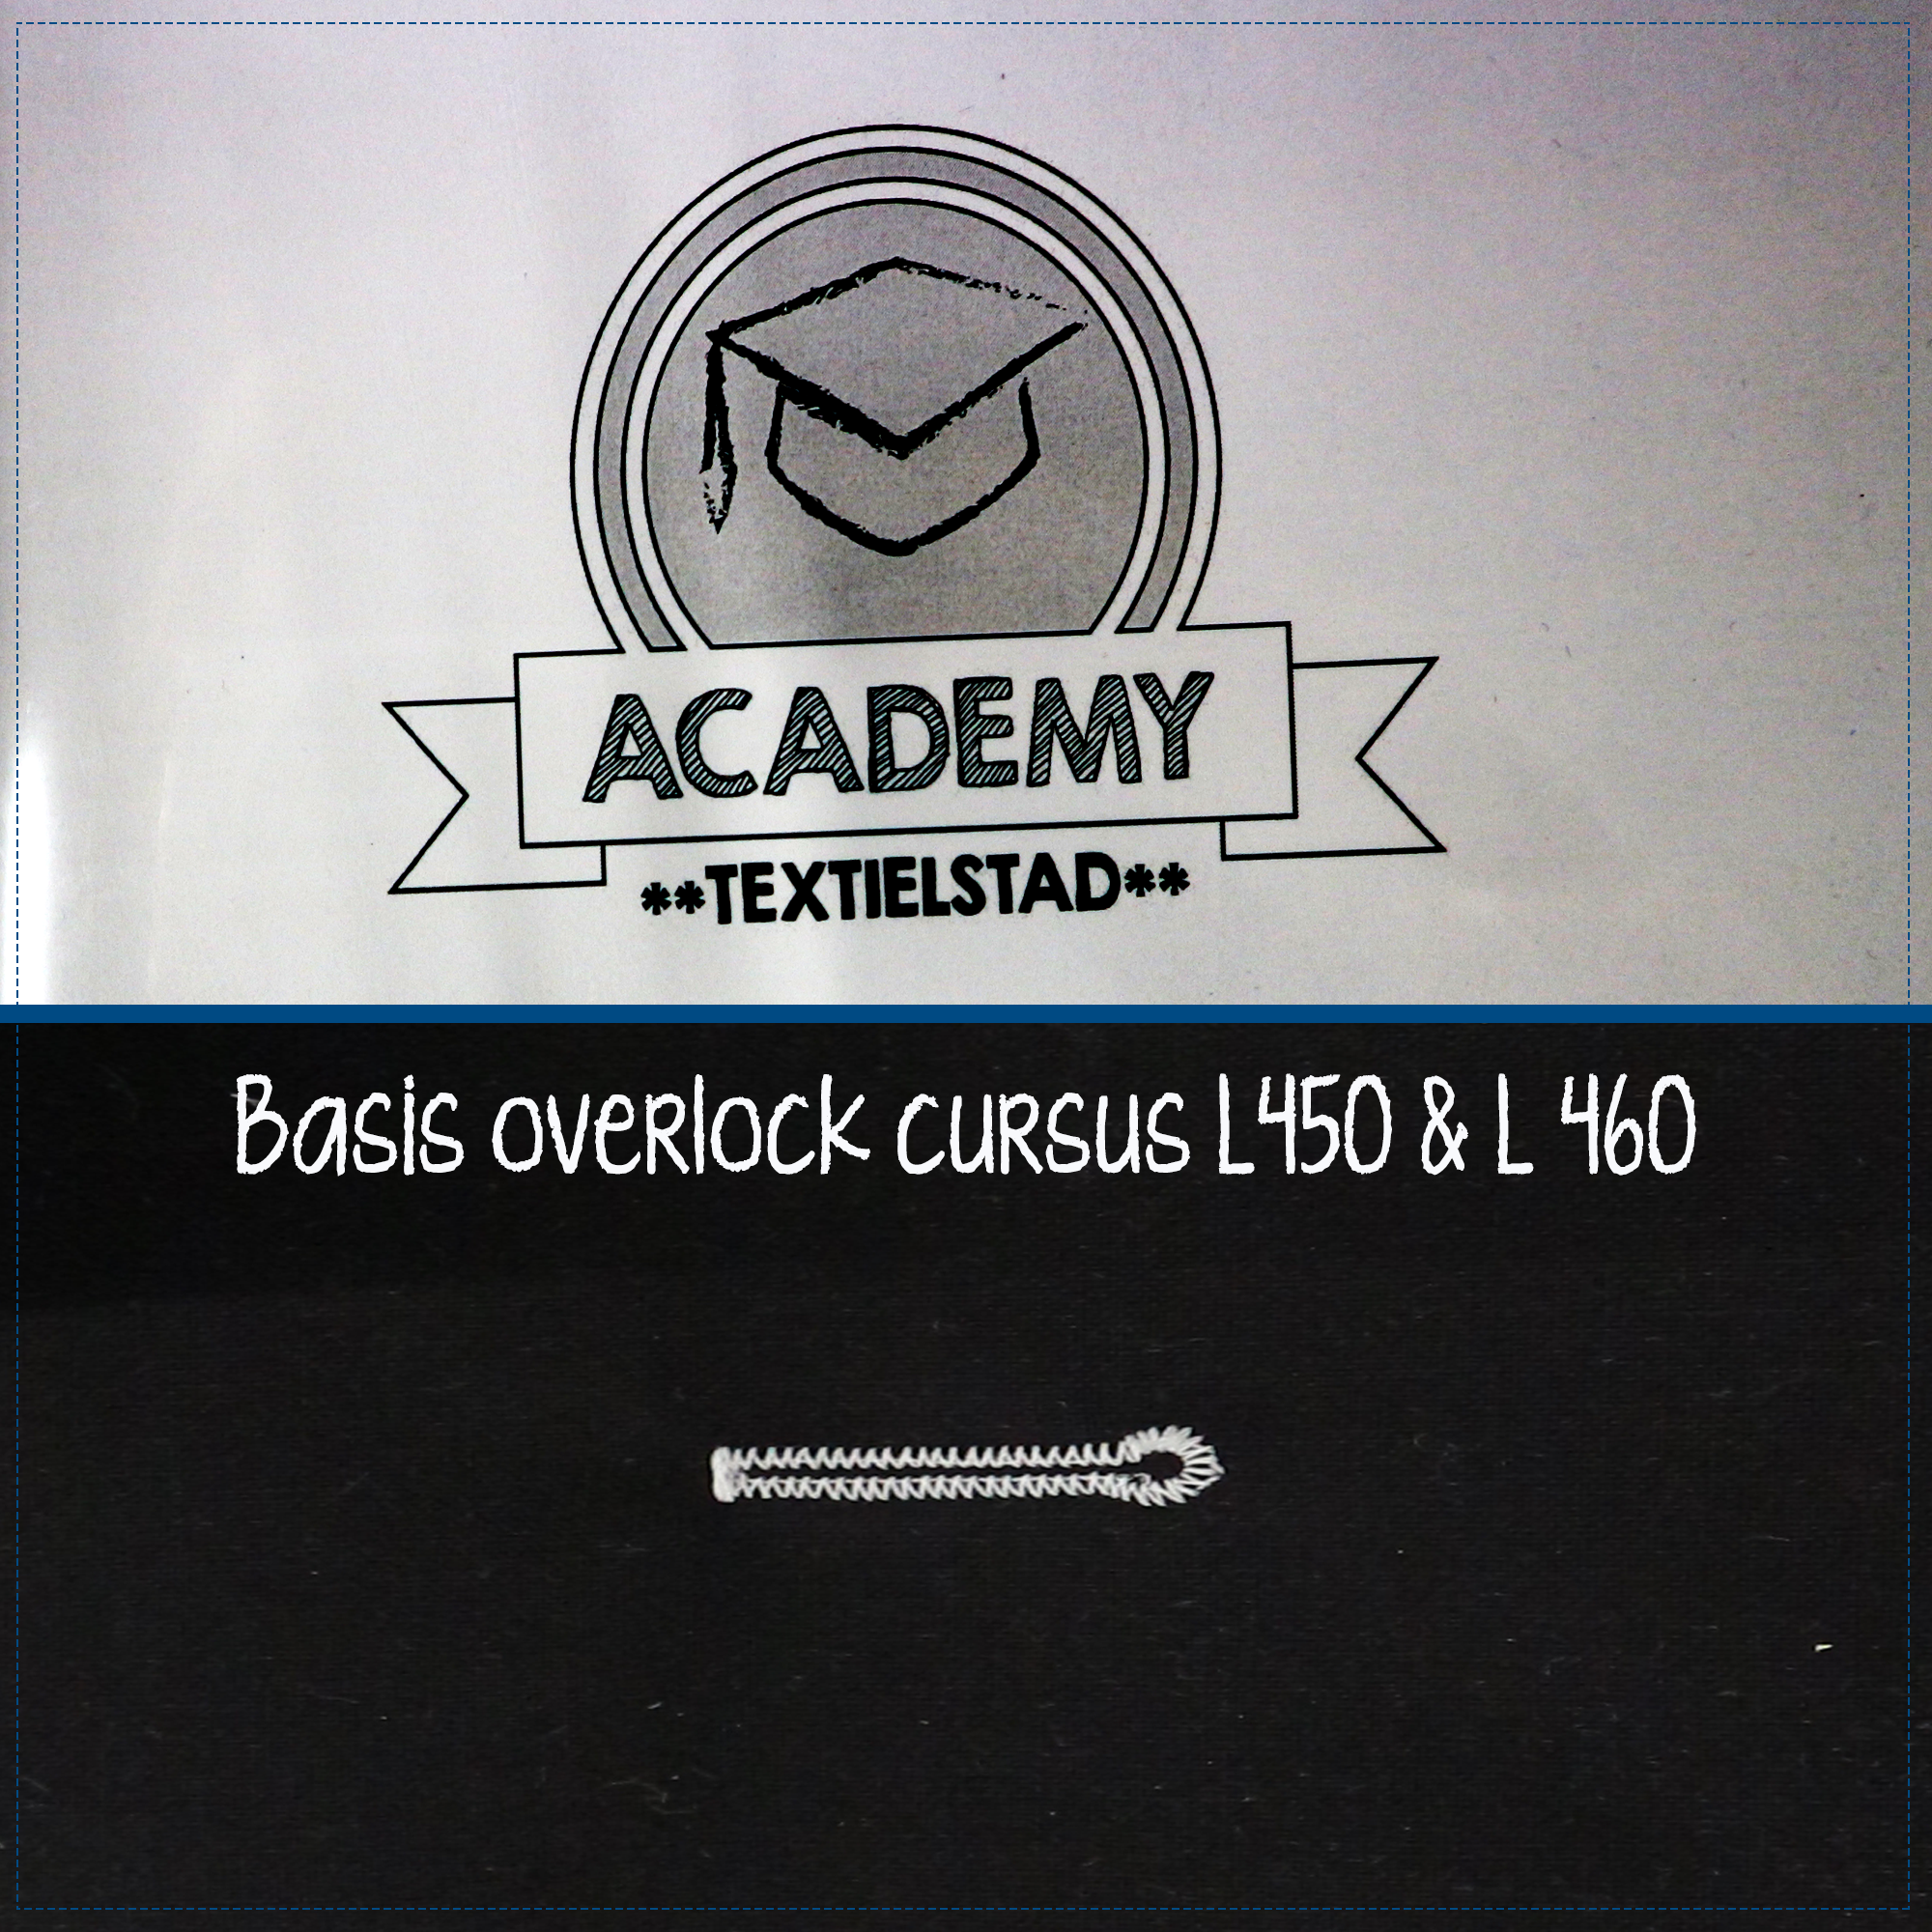 Basis overlock cursus